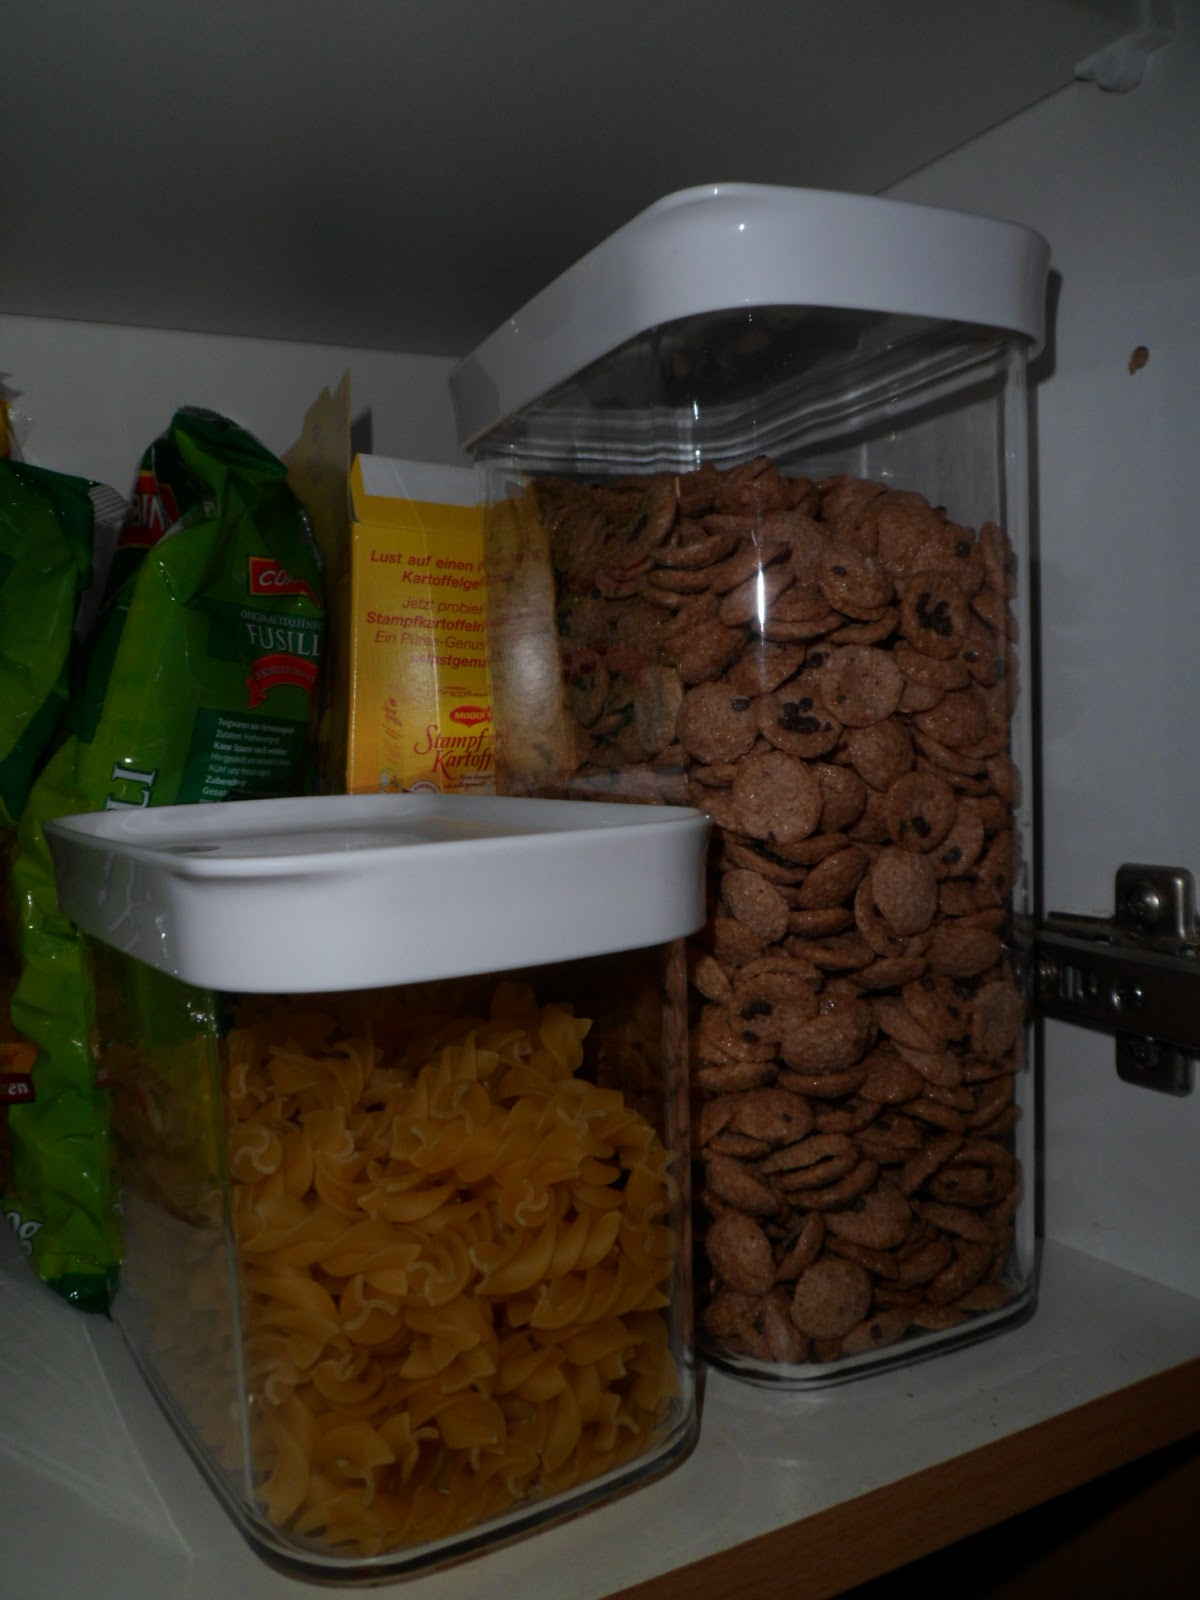 dosen container lagerung